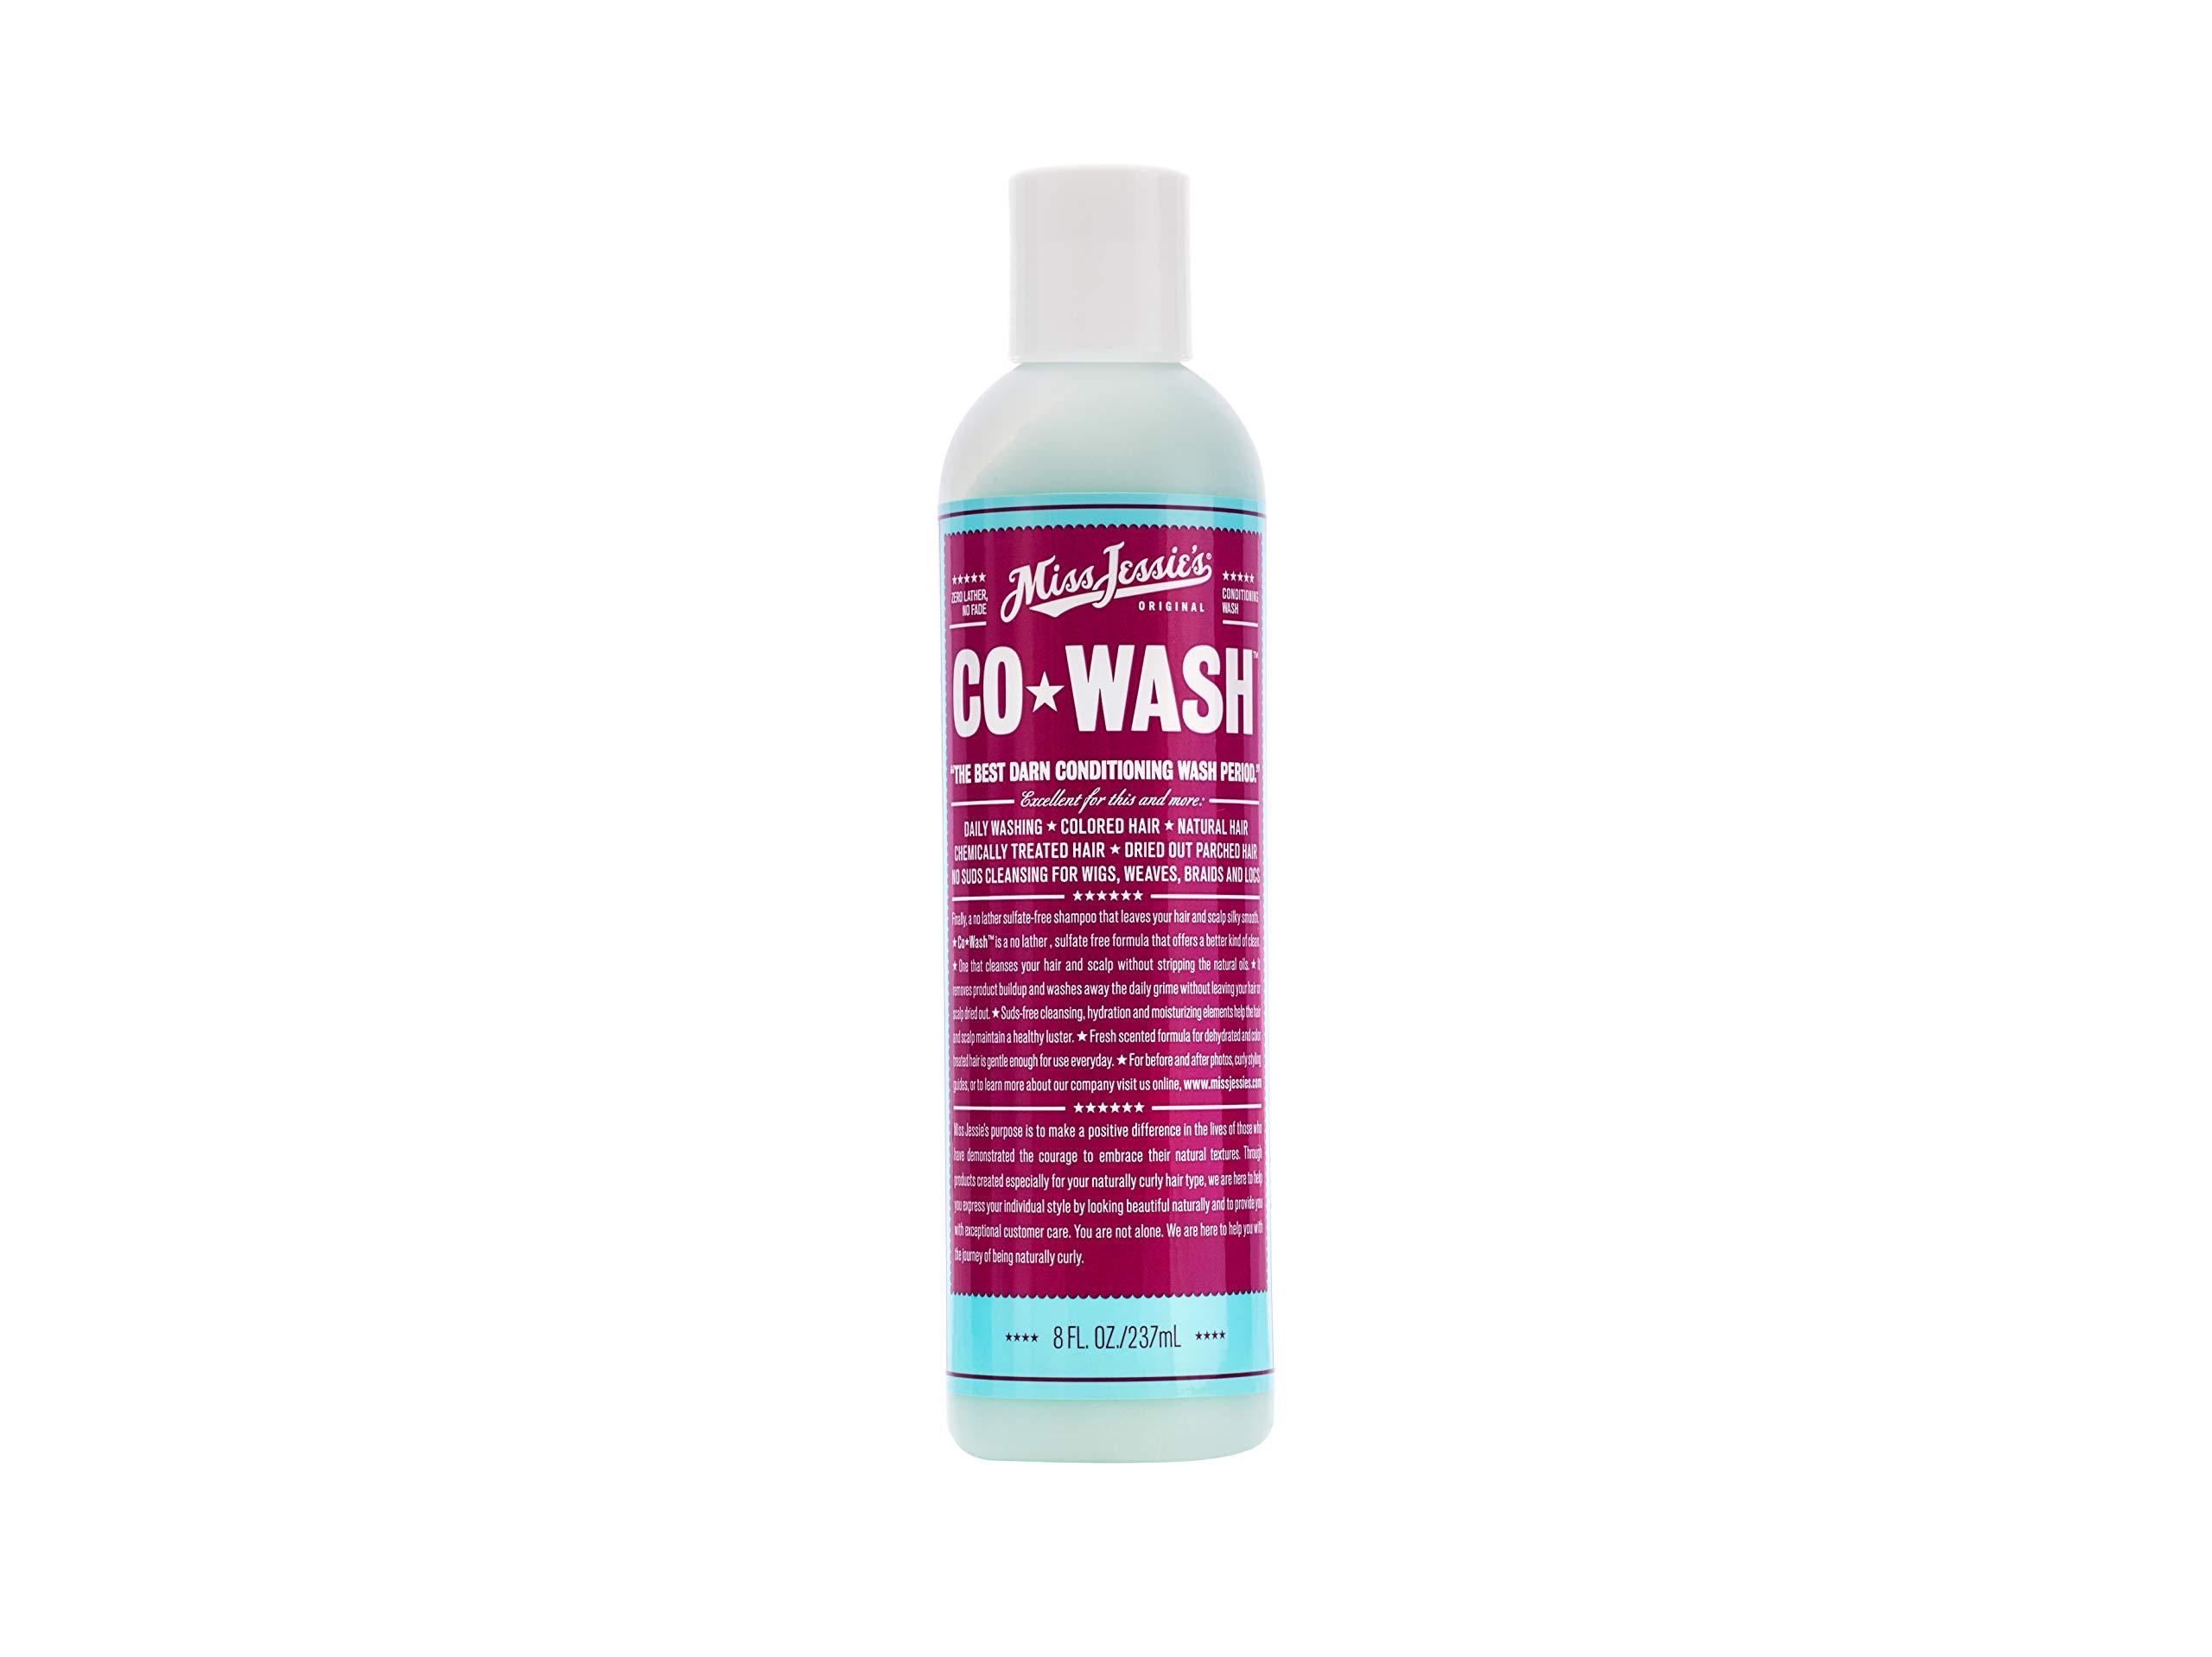 Miss Jessie's Co-wash 8 fl oz